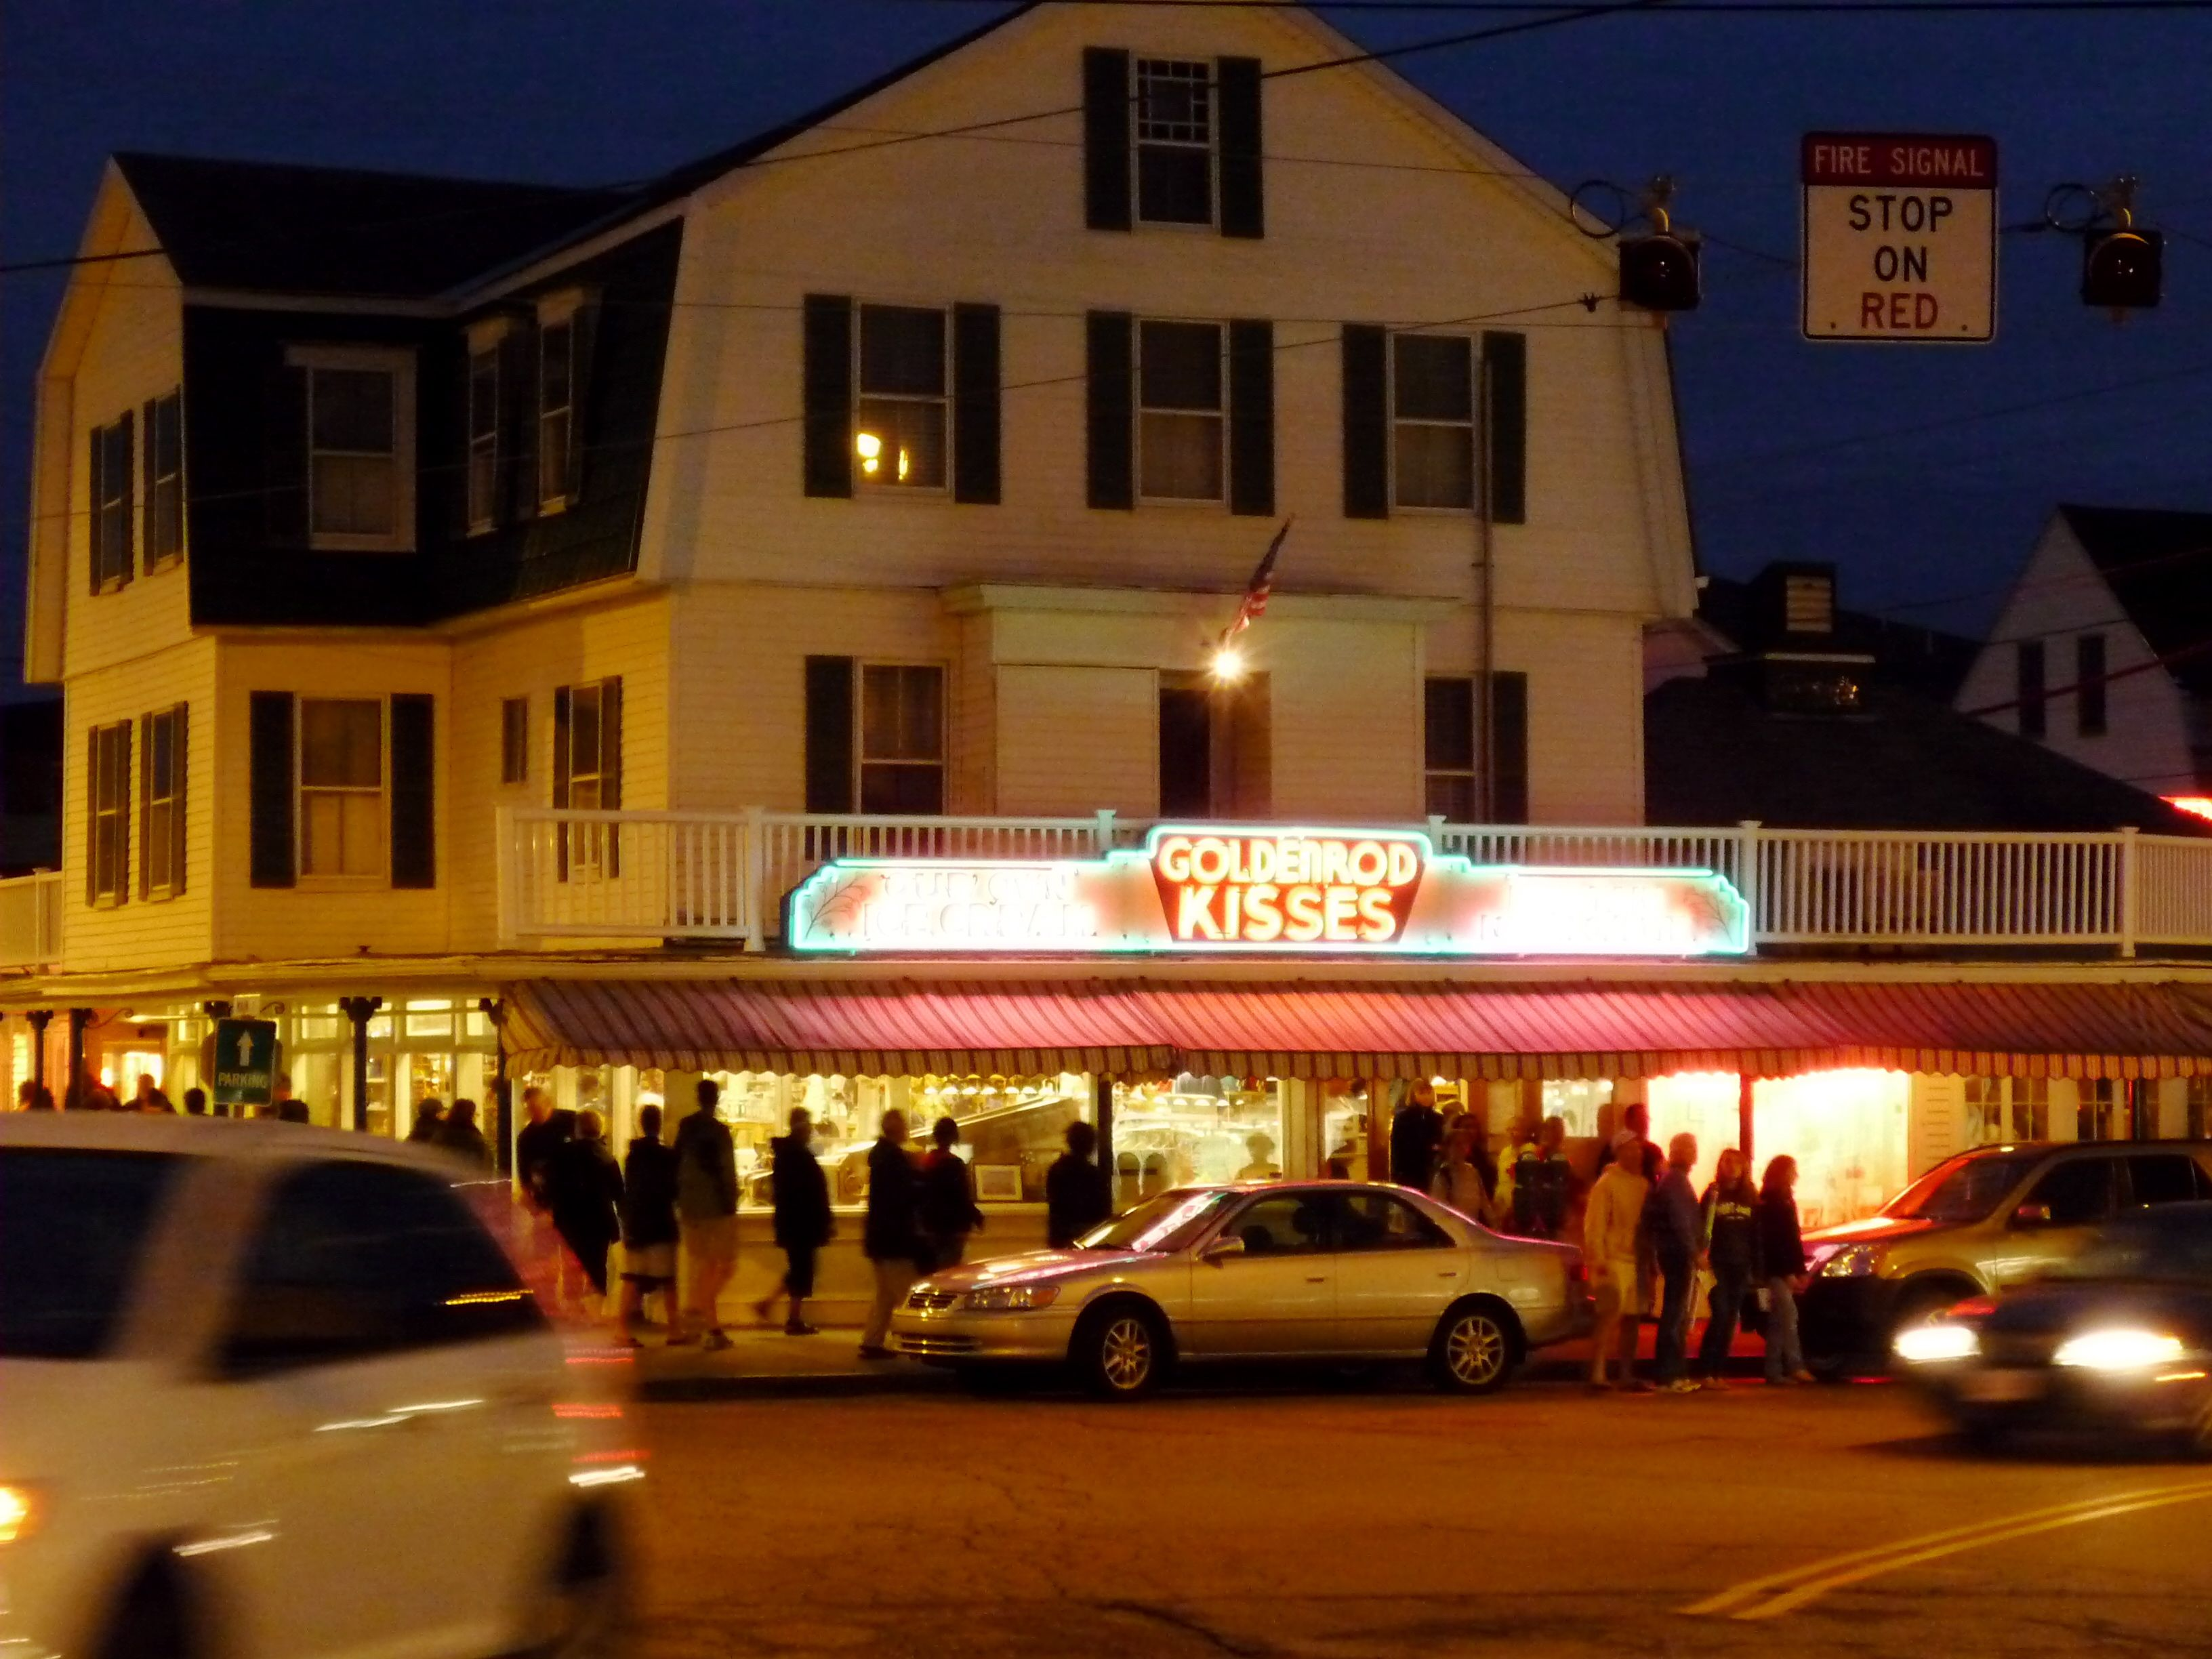 The Goldenrod Restaurant In York Beach Maine Where They Make Salt Water Taffy